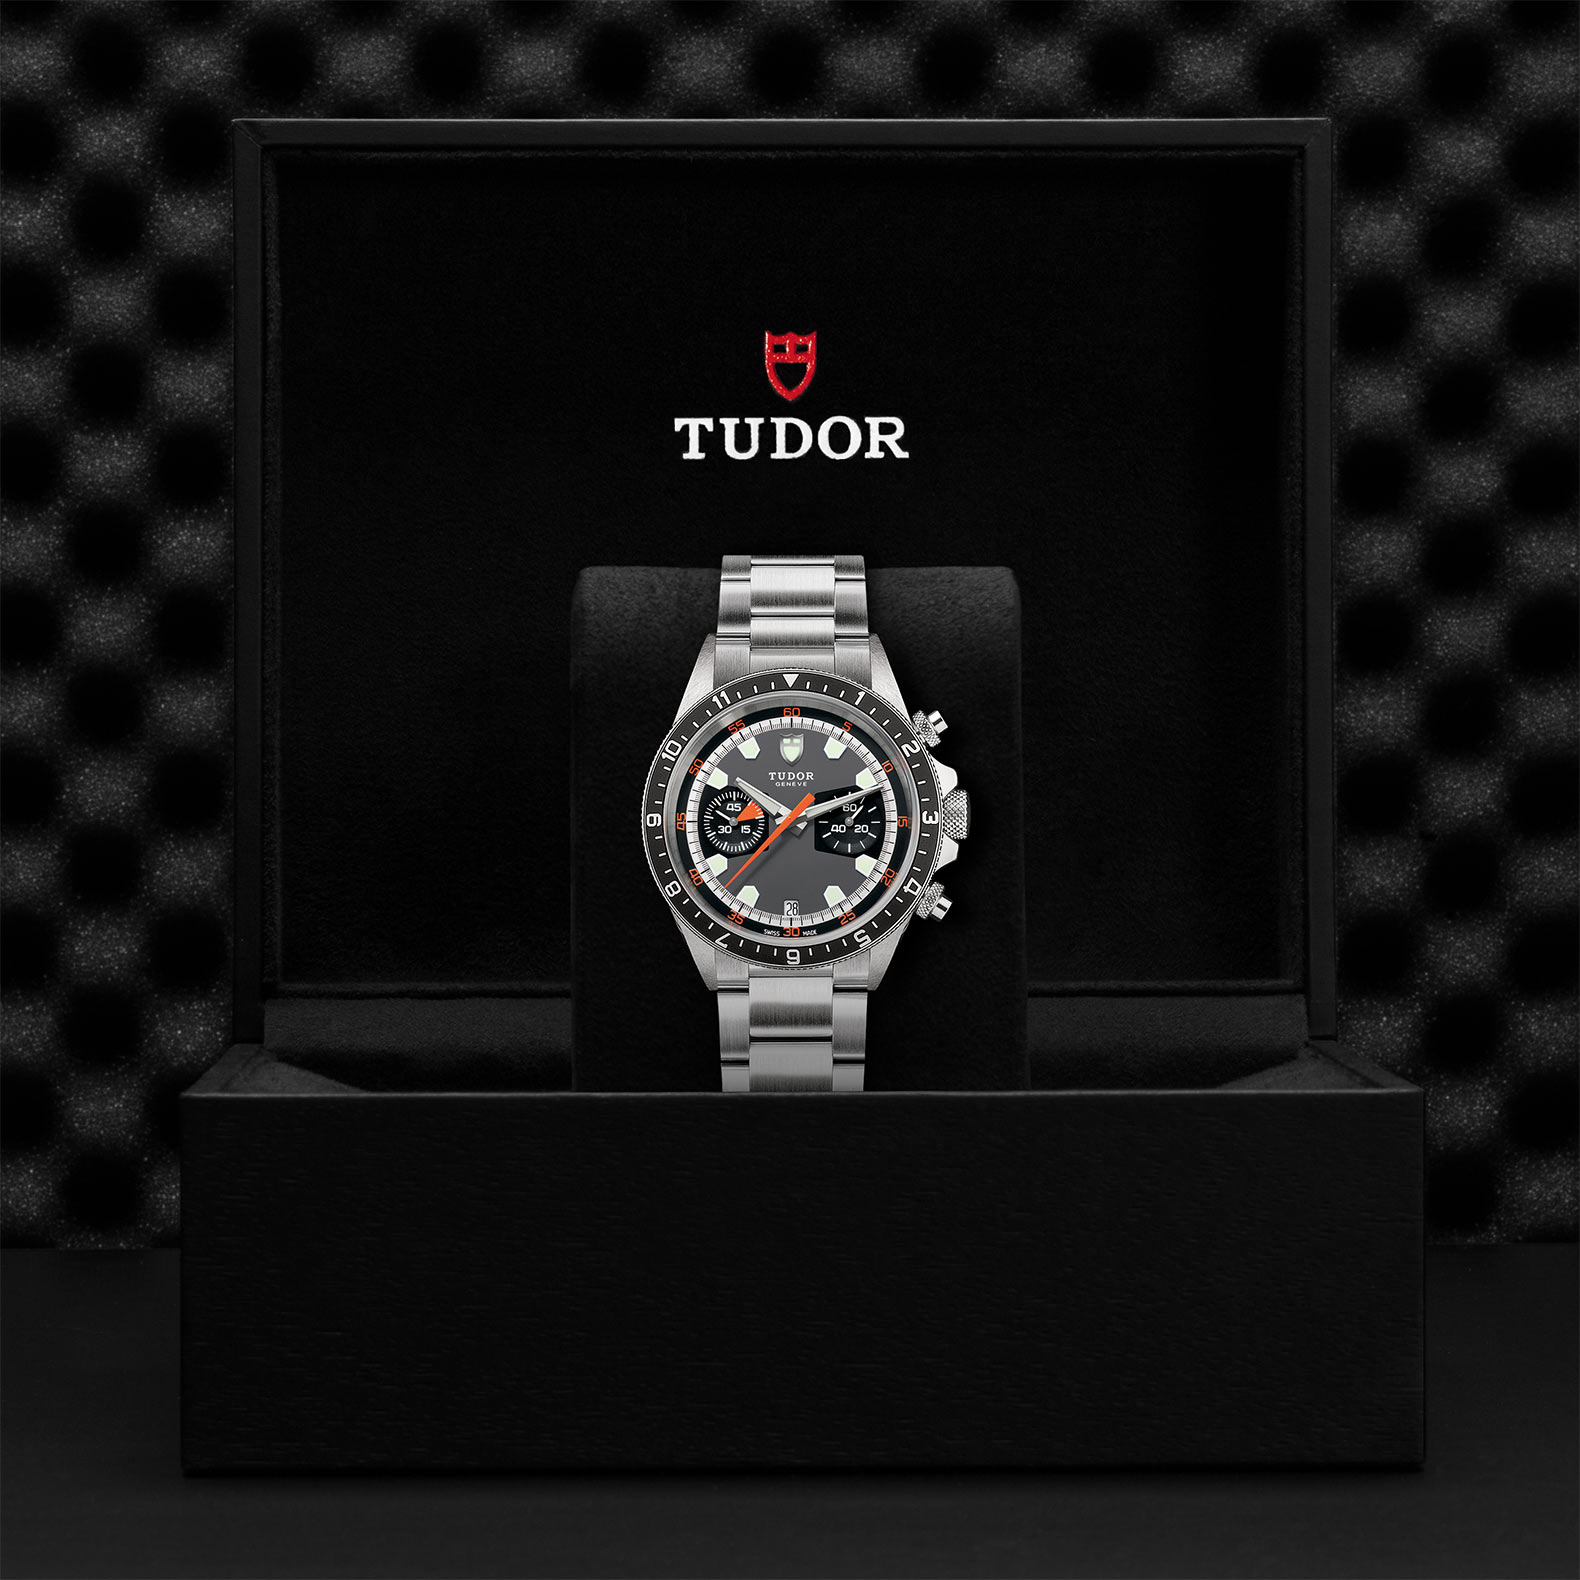 TUDOR Heritage Chrono M70330N 0006 Presentation